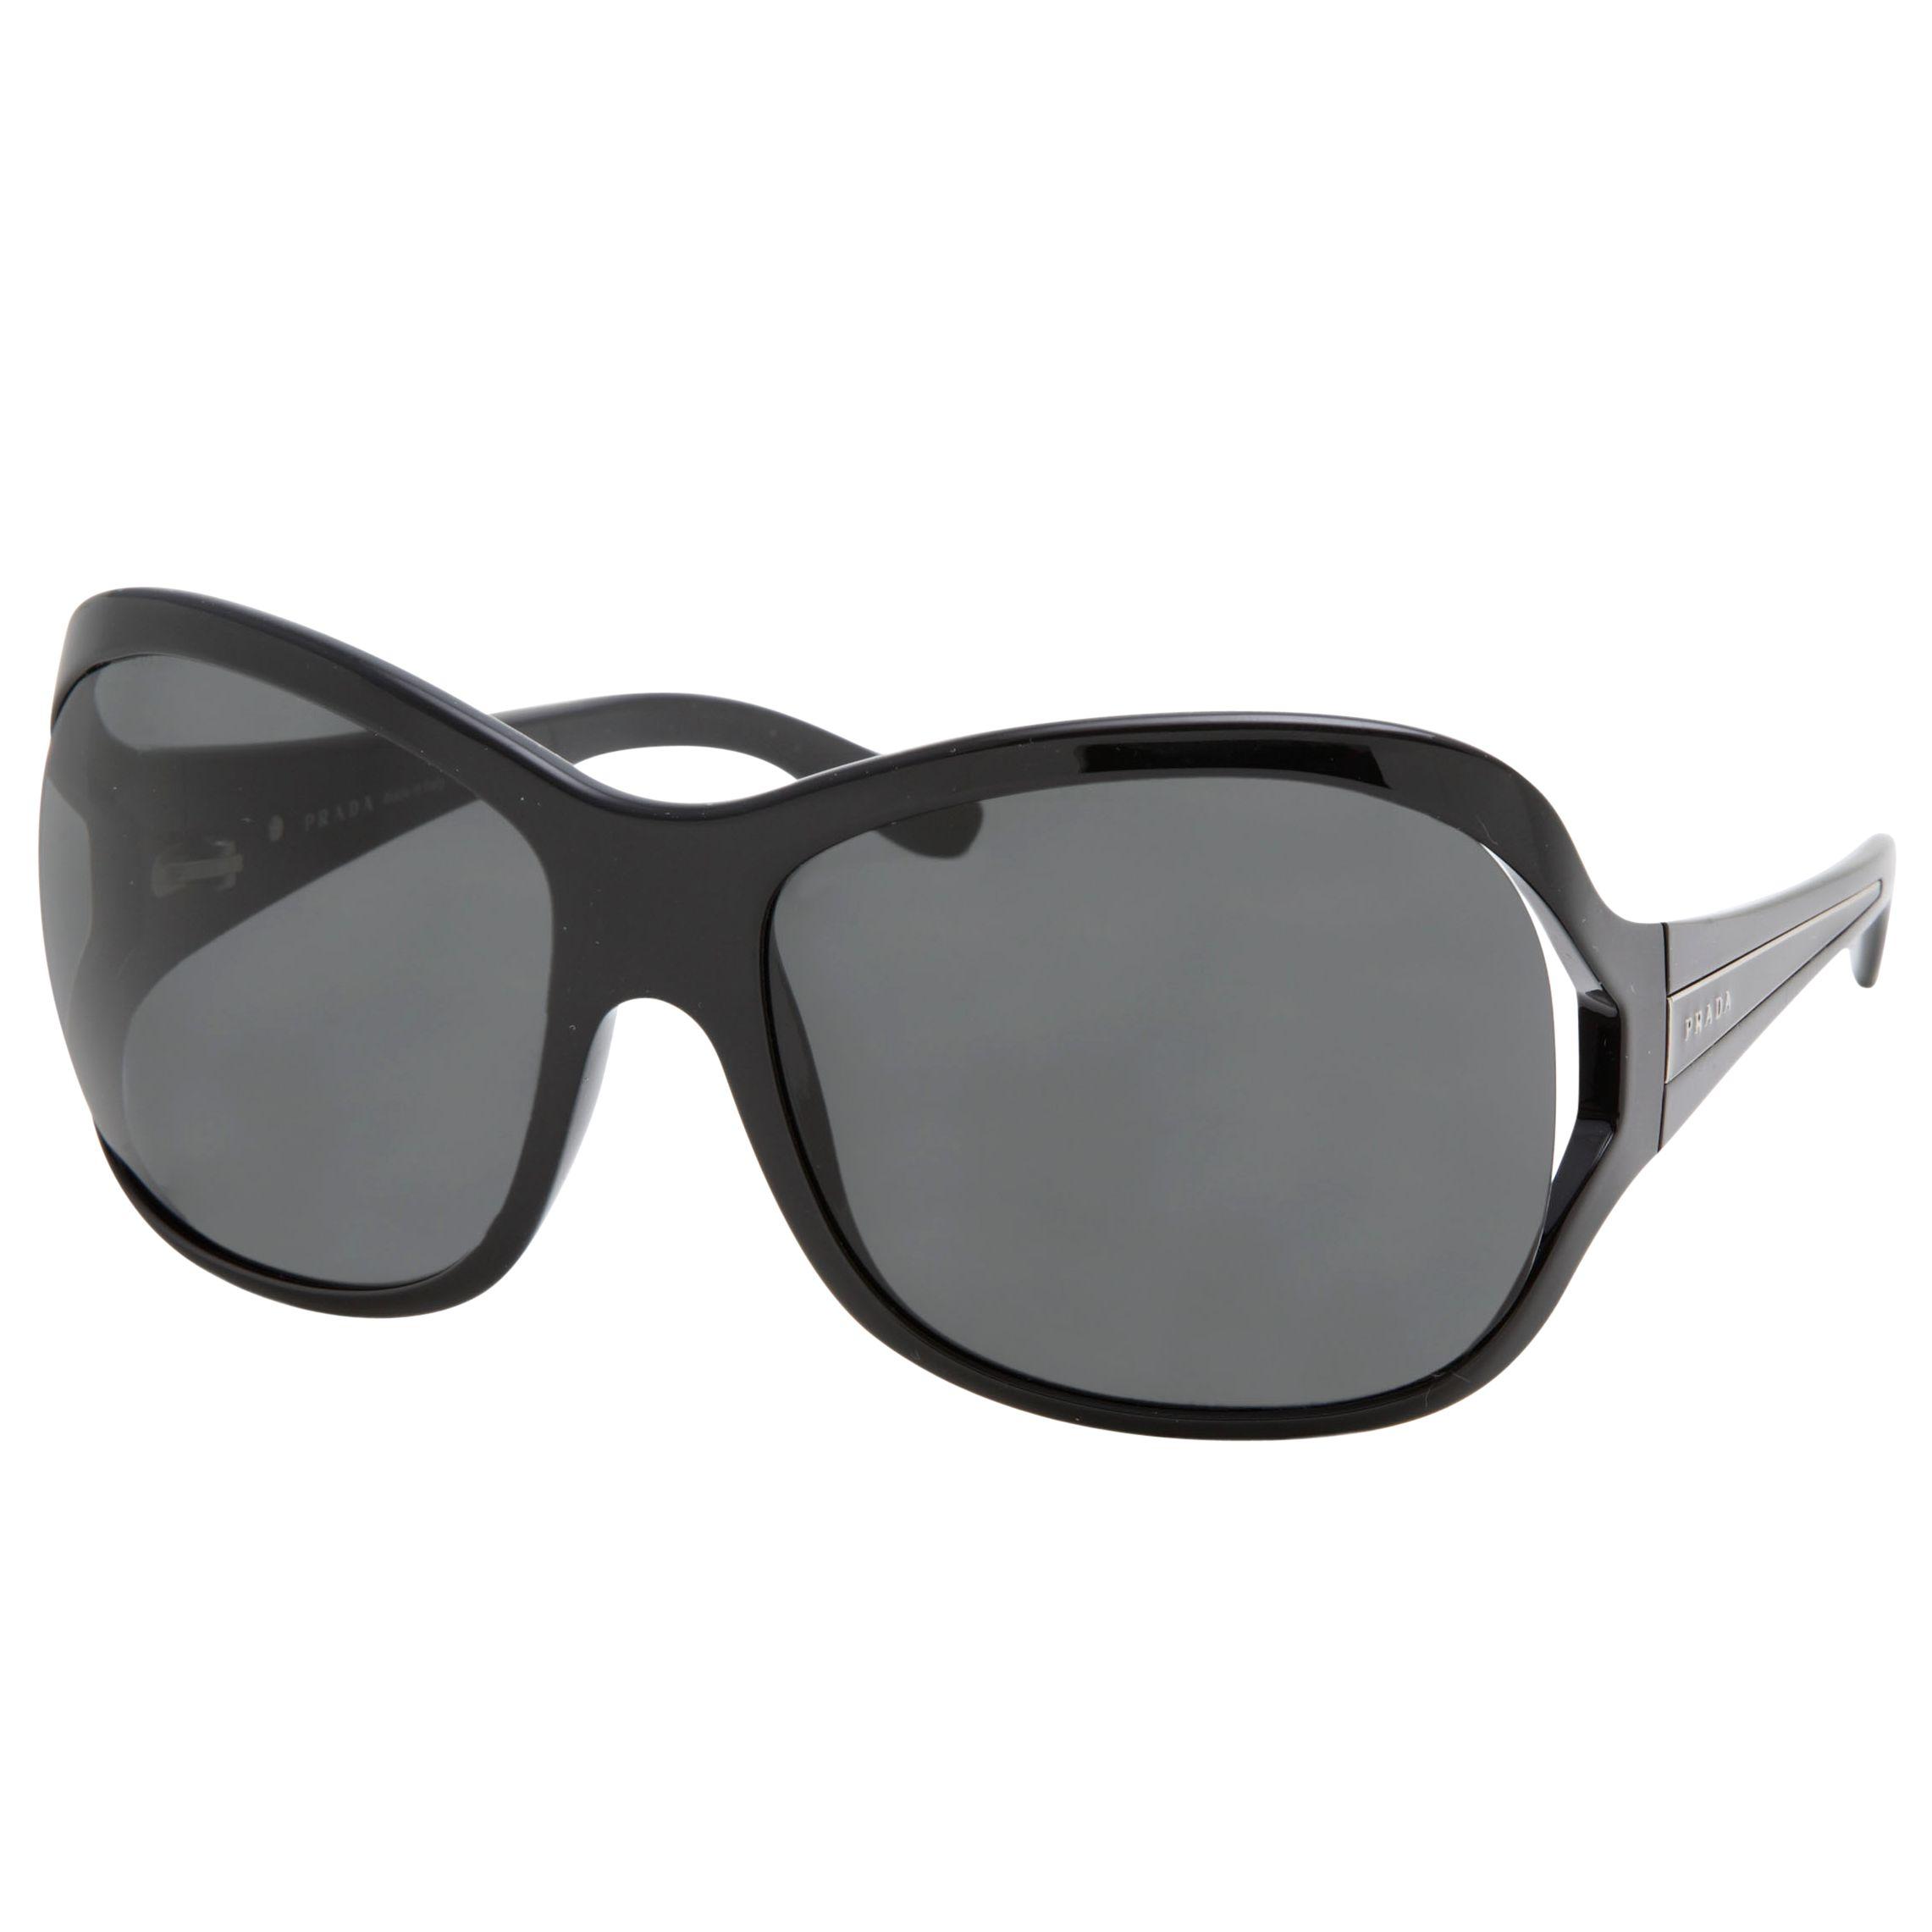 Prada Women's Large Cut-Out Lens Sunglasses, Tortoiseshell at John Lewis